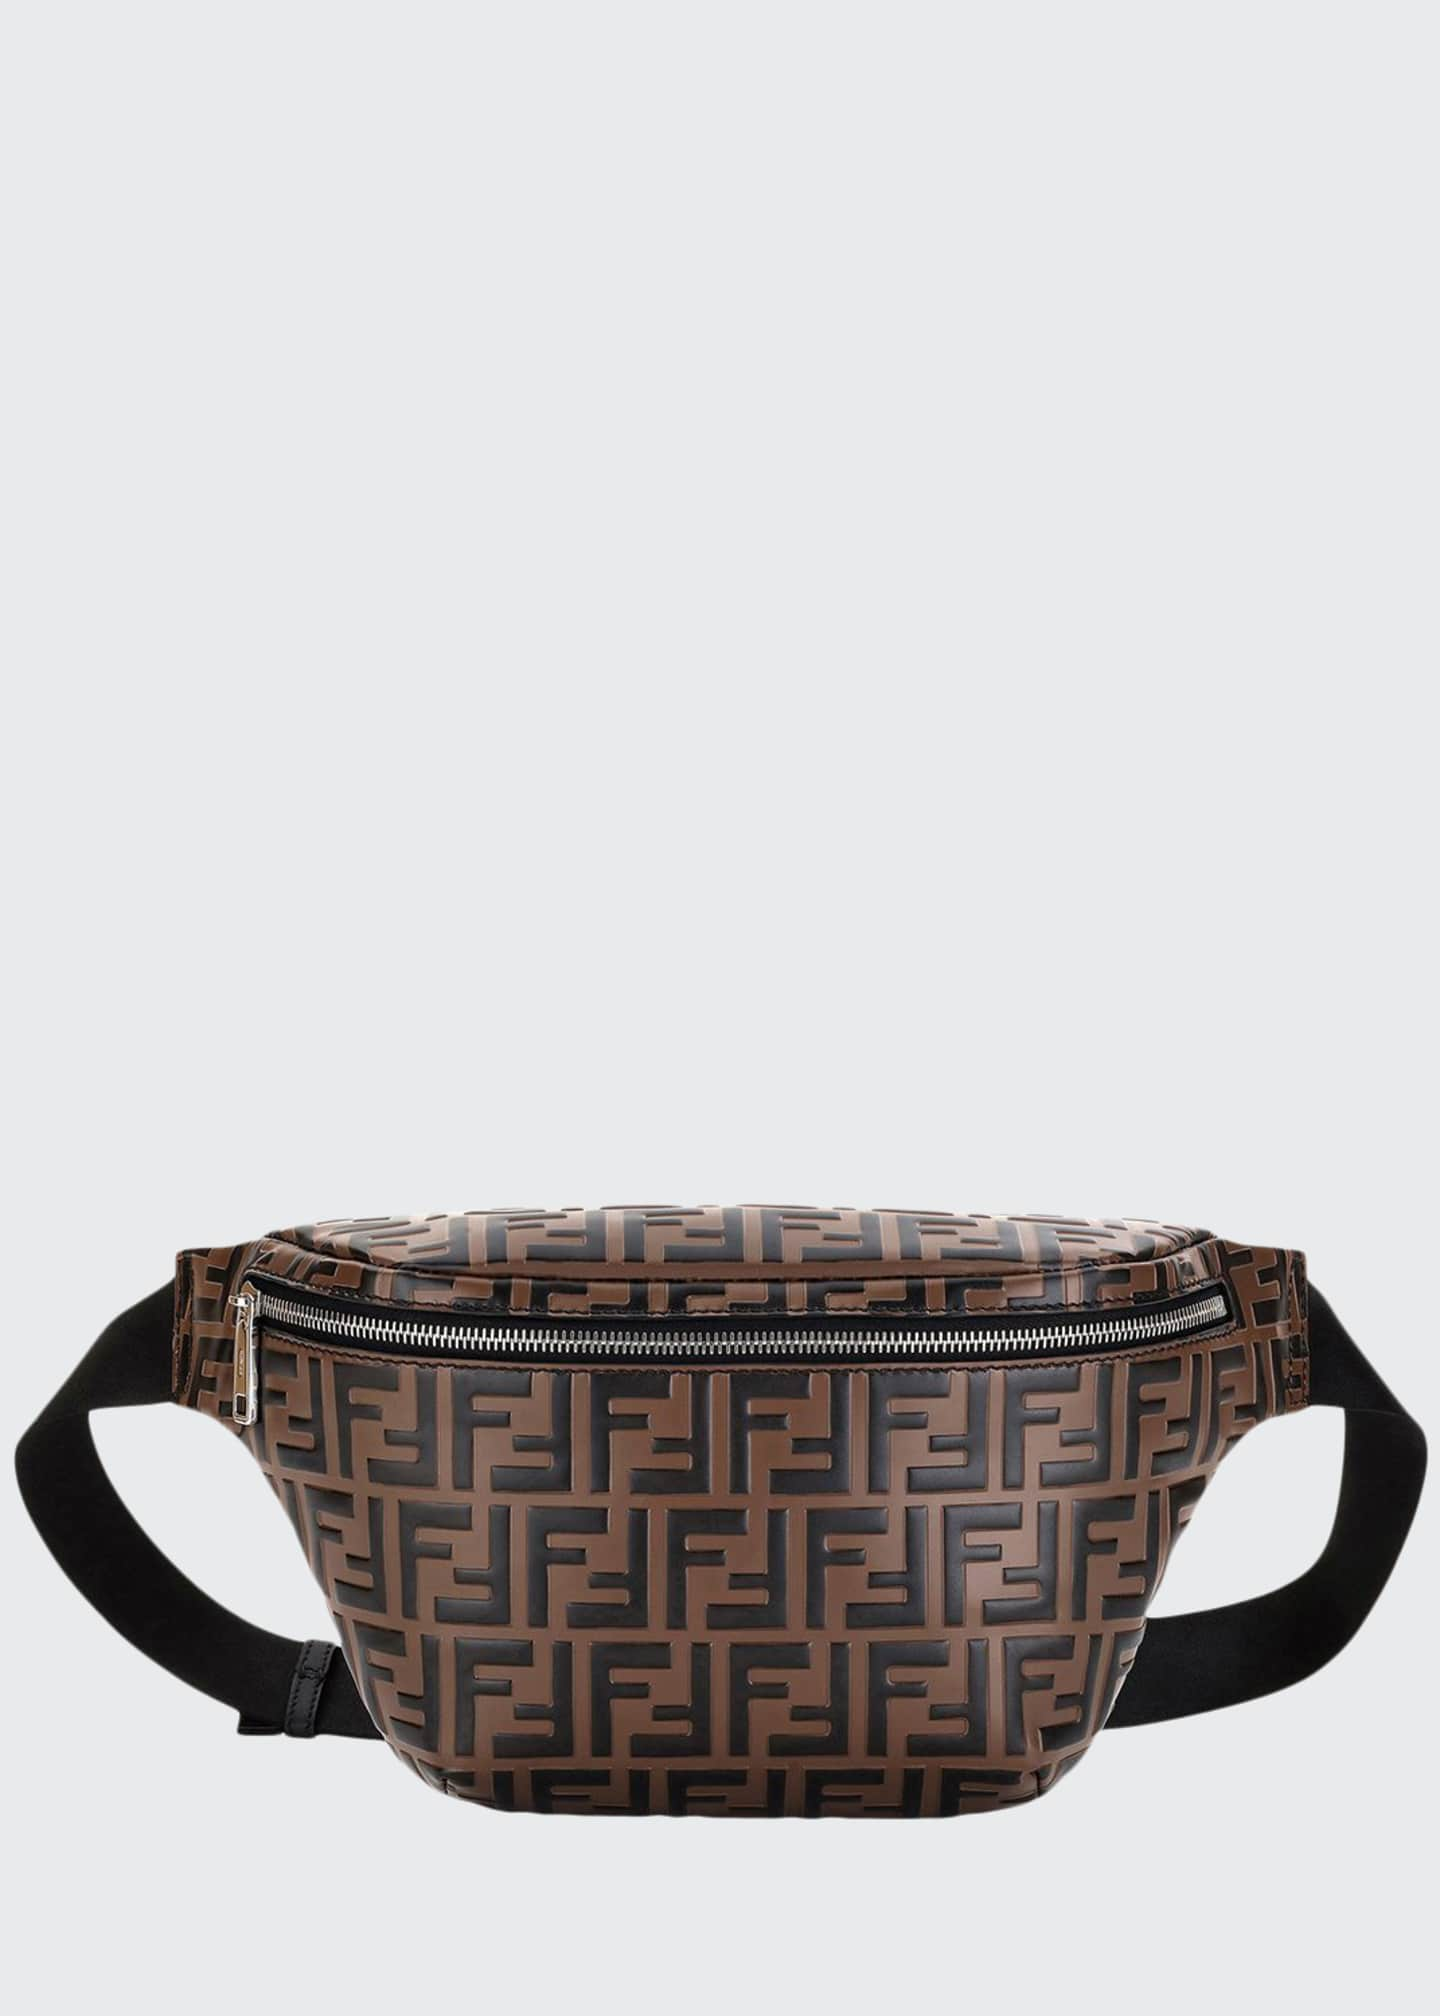 Fendi Men's Embossed Leather Belt Bag/Fanny Pack